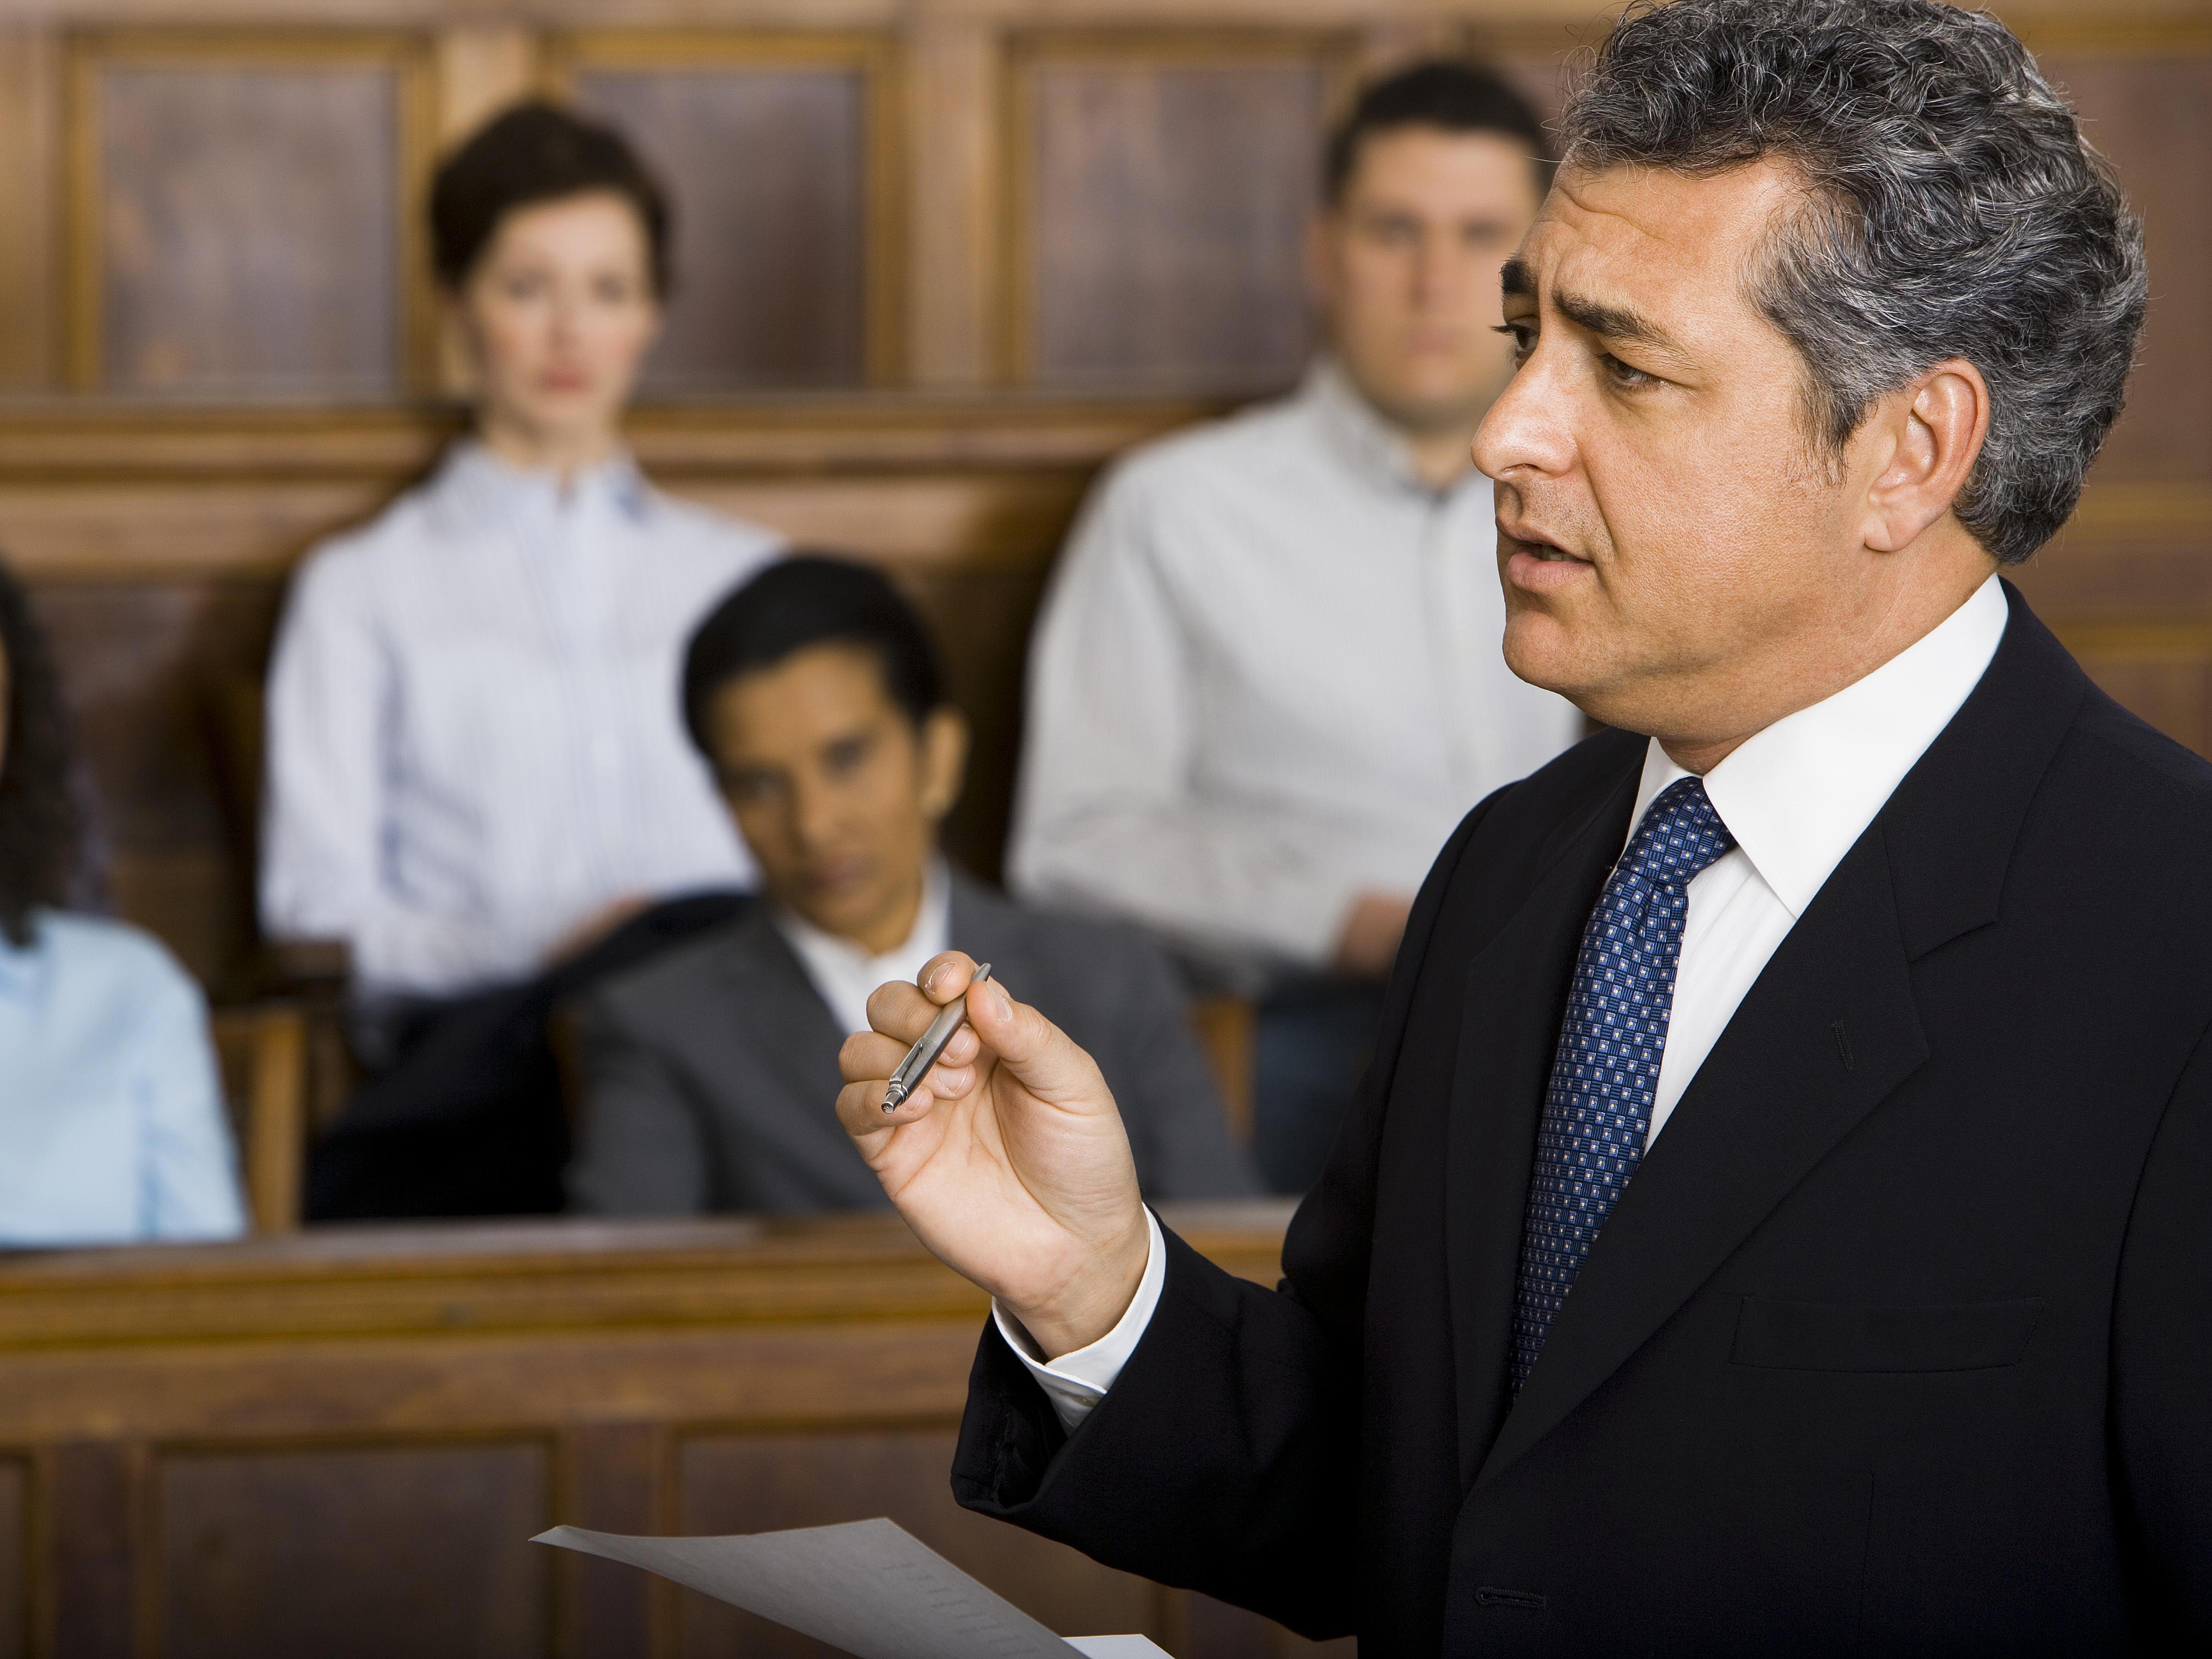 Medical Malpractice Lawyer Job Description